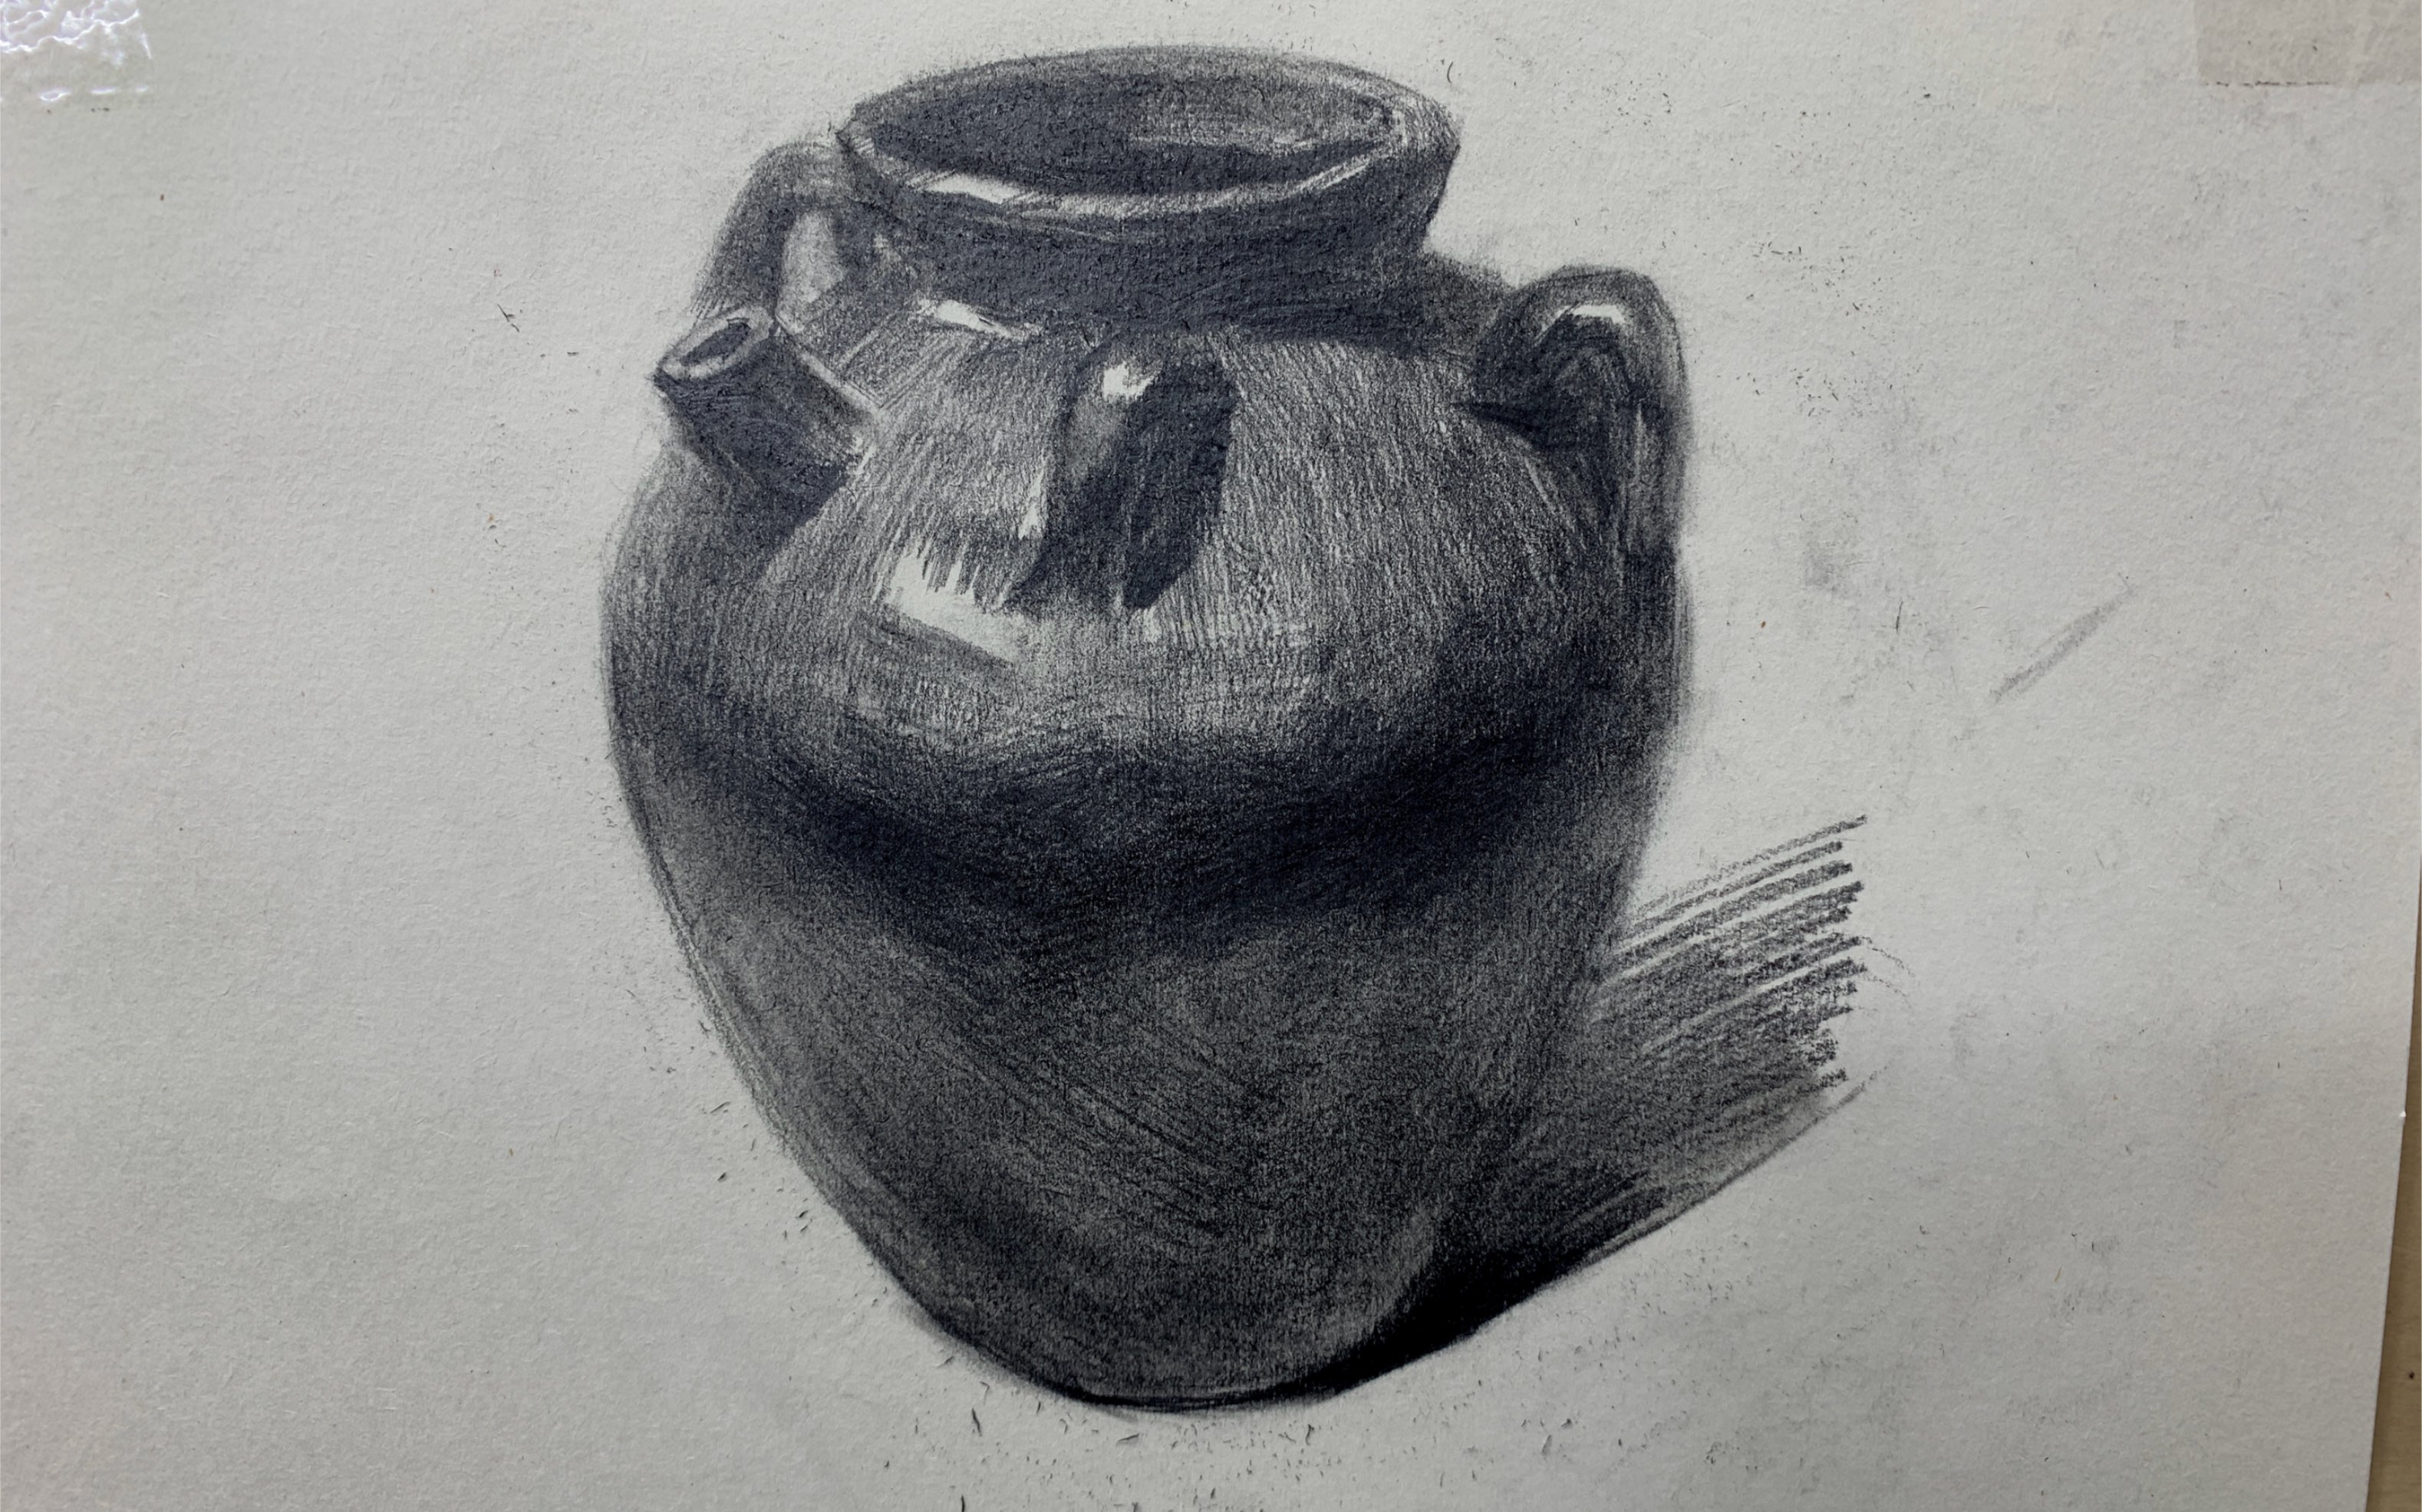 "静物素描罐子_素描静物""陶罐""——上色讲解_哔哩哔哩 (゜-゜)つロ 干杯~-bilibili"